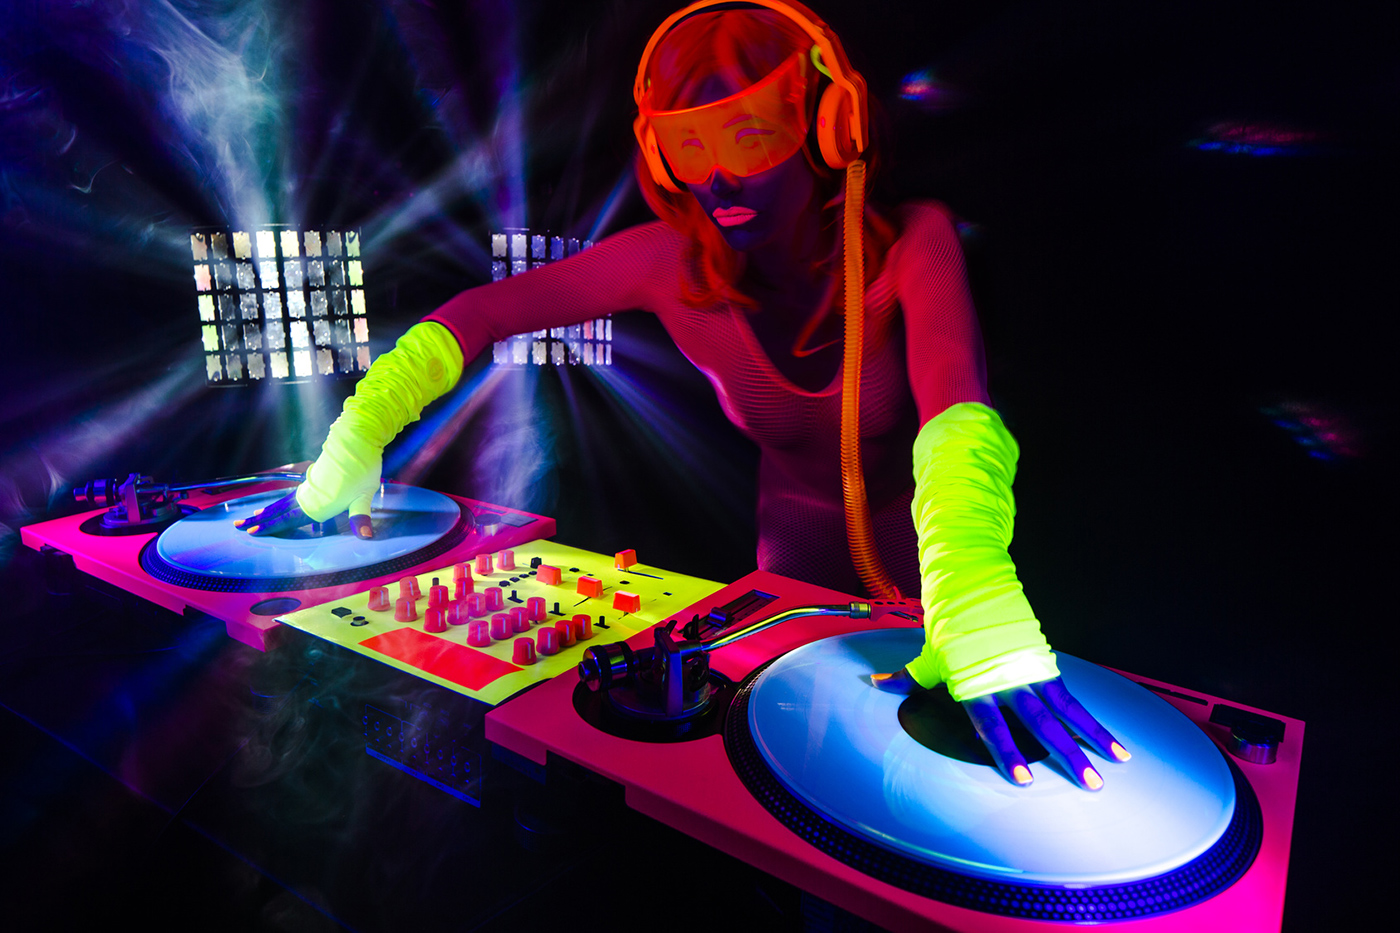 Acid trance dj's night